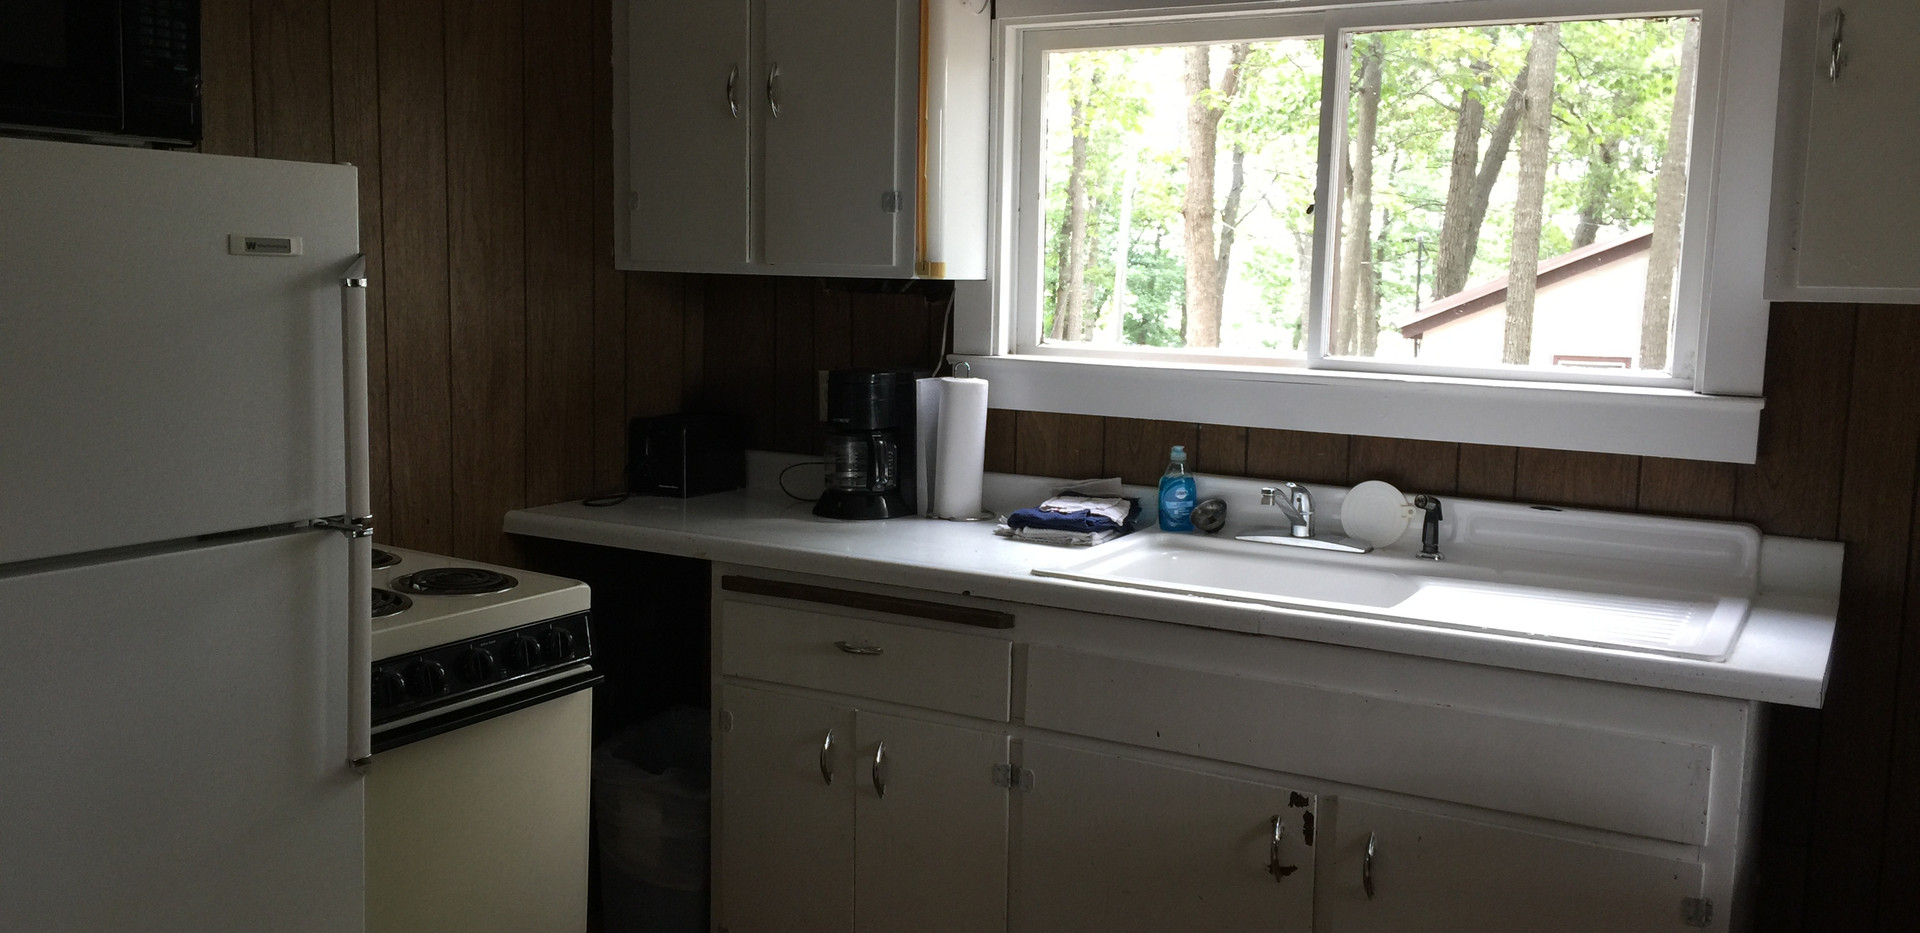 Cabin #1 - Full Kitchen